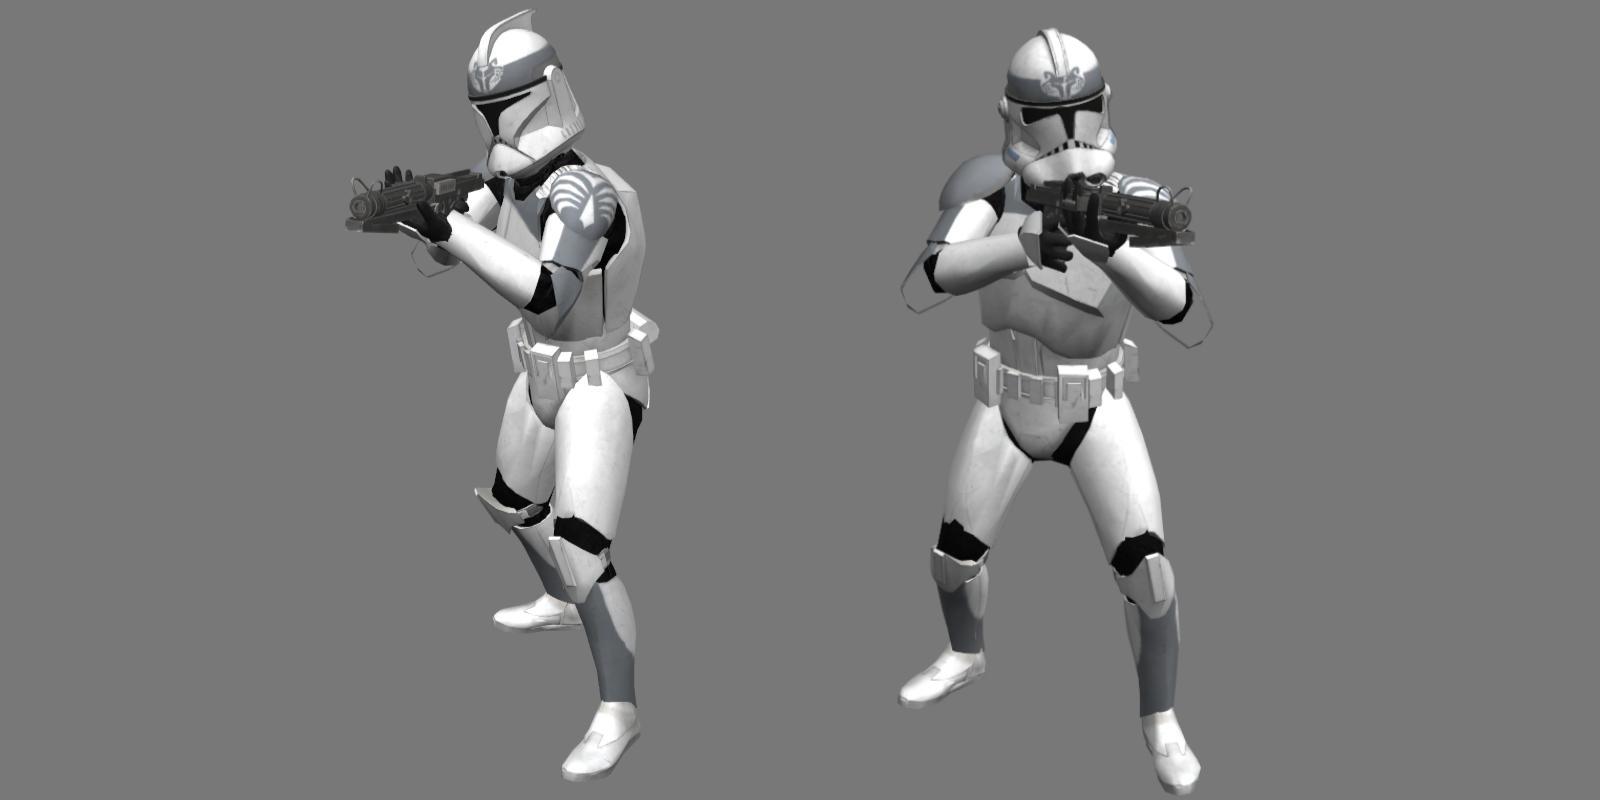 104th battalion image republic assault the clone wars mod for